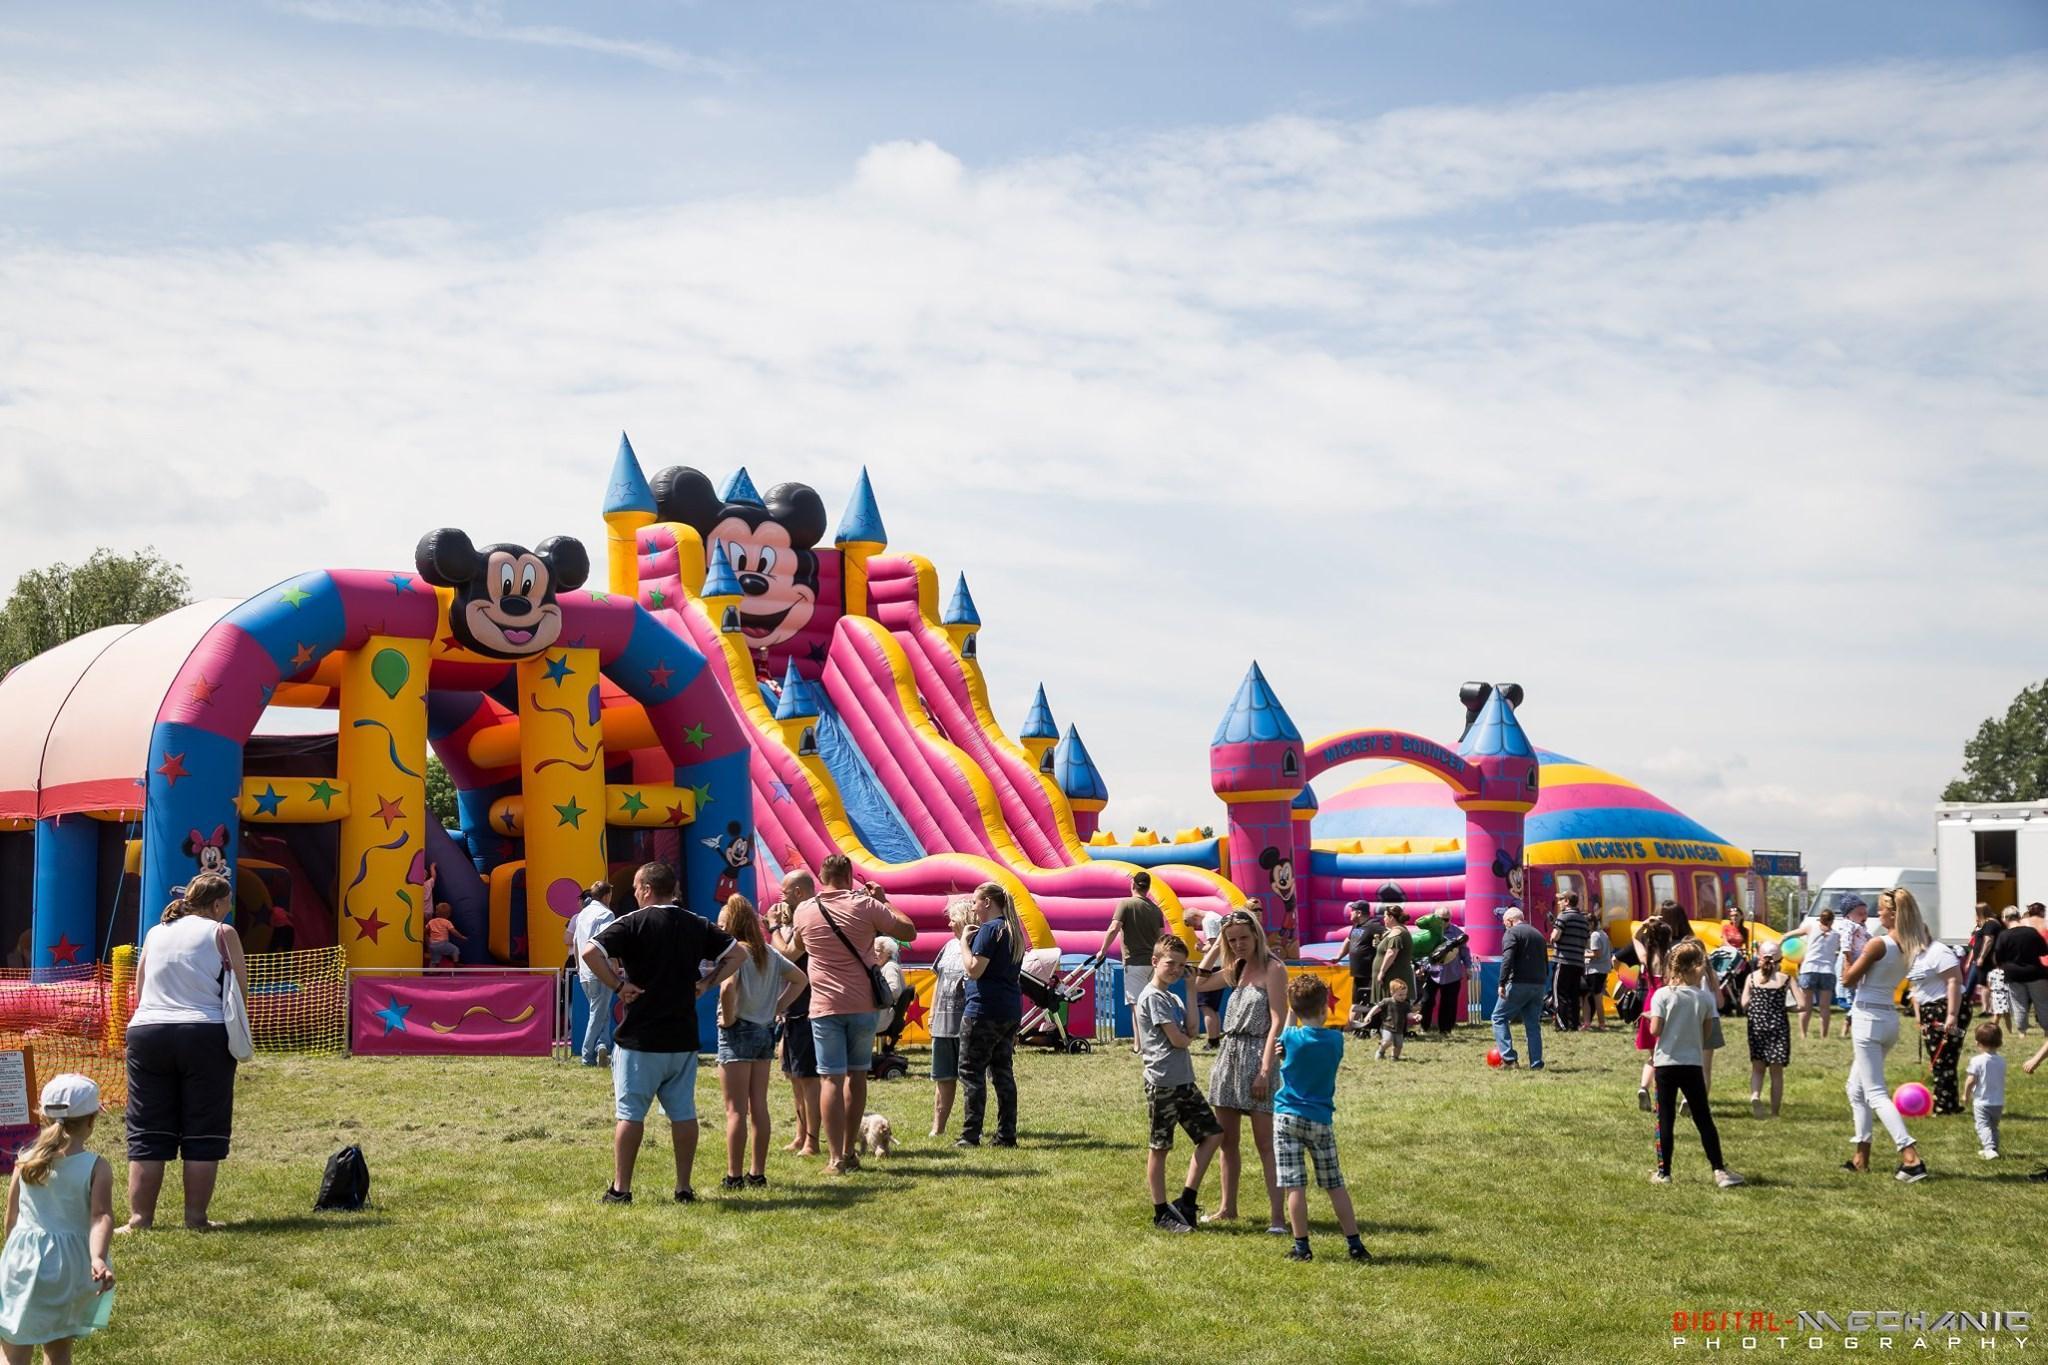 Festival of Leisure Melton Mowbray